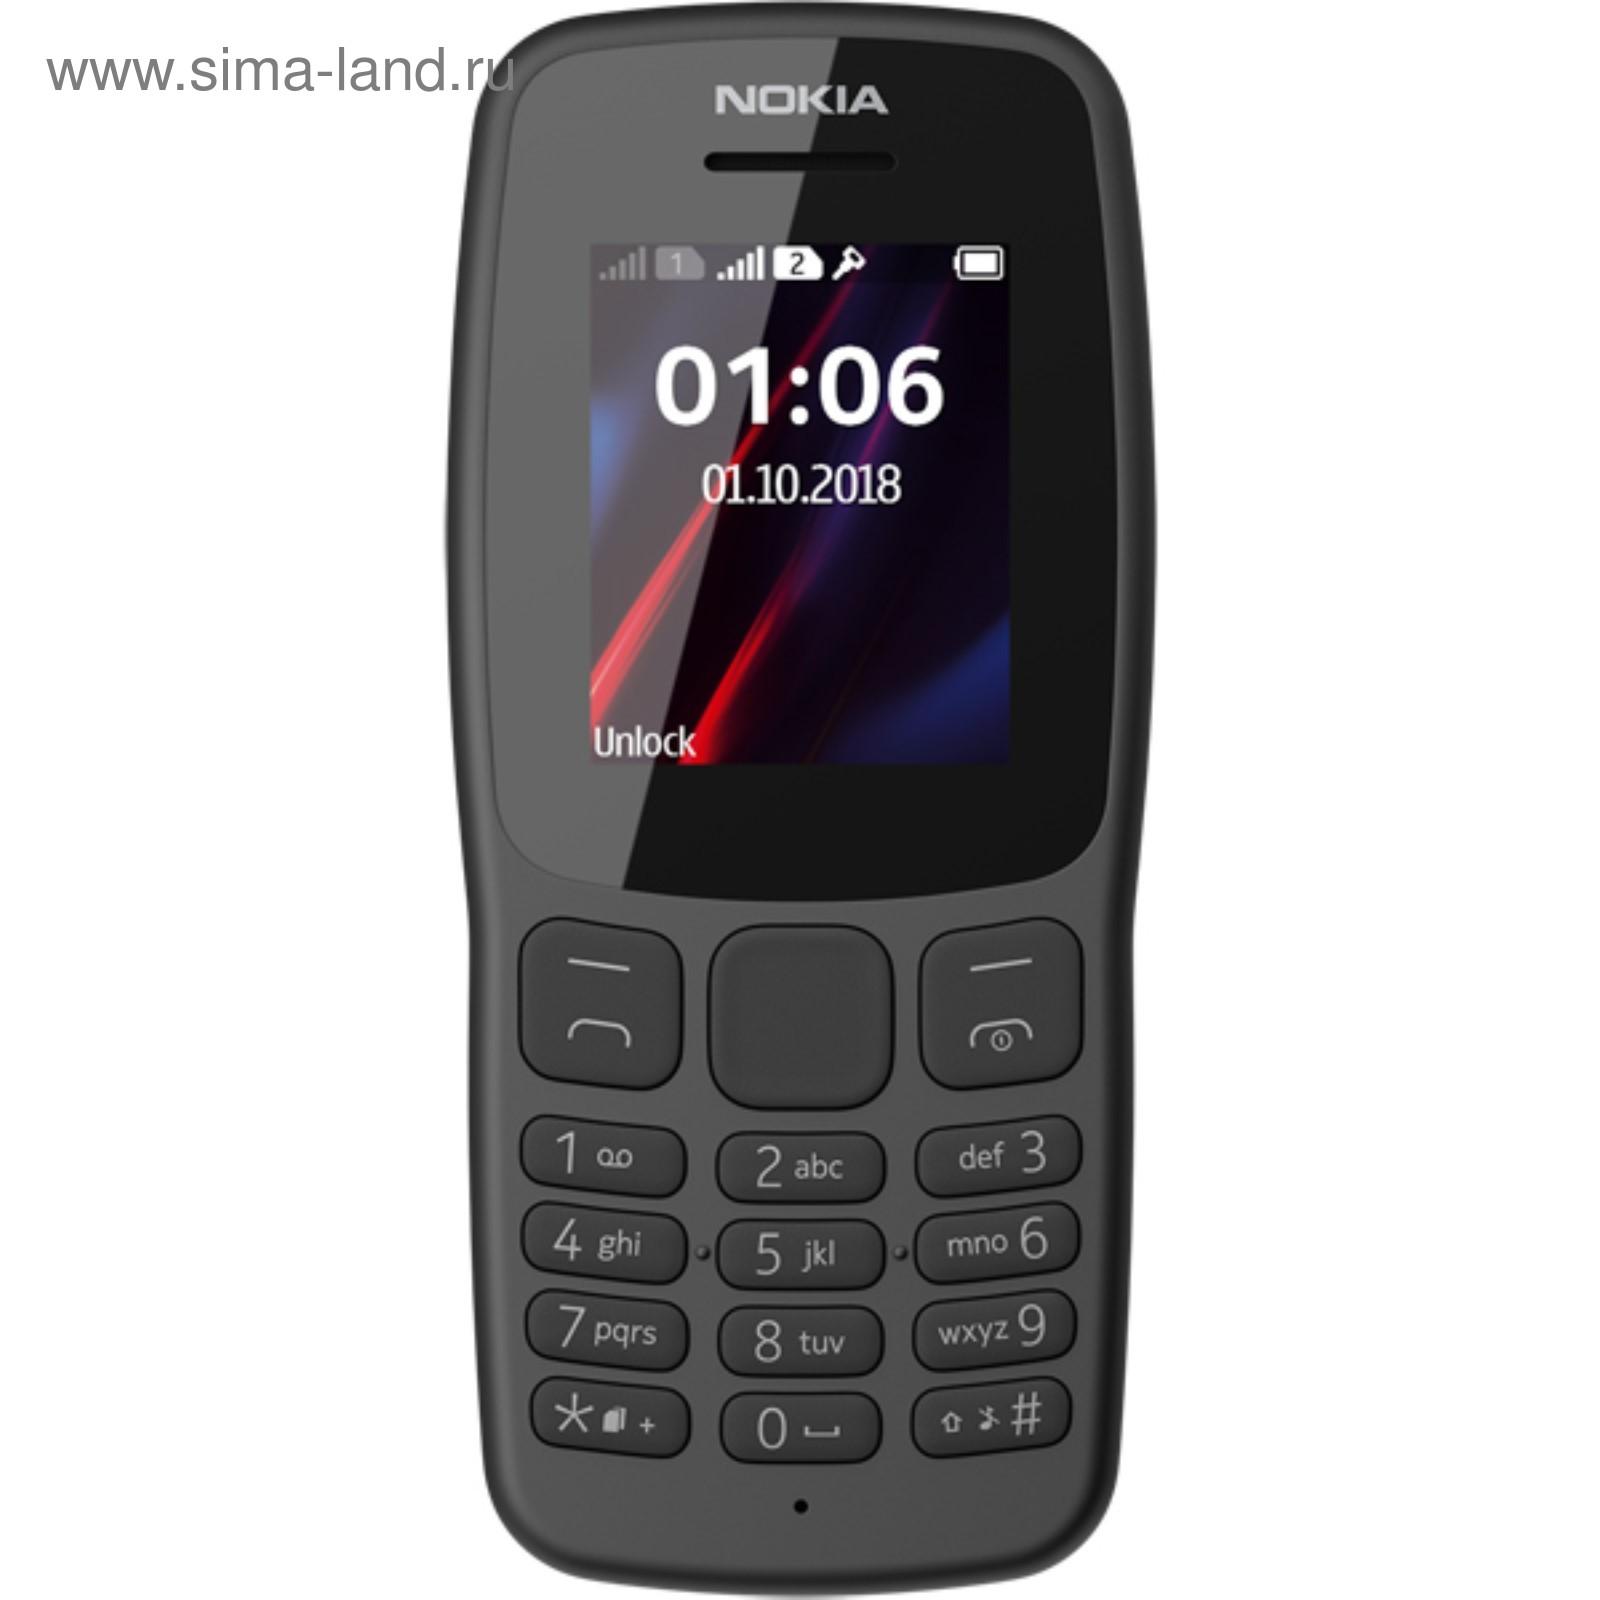 4a2abeffd68 Сотовый телефон Nokia 106 DS (TA-1114)